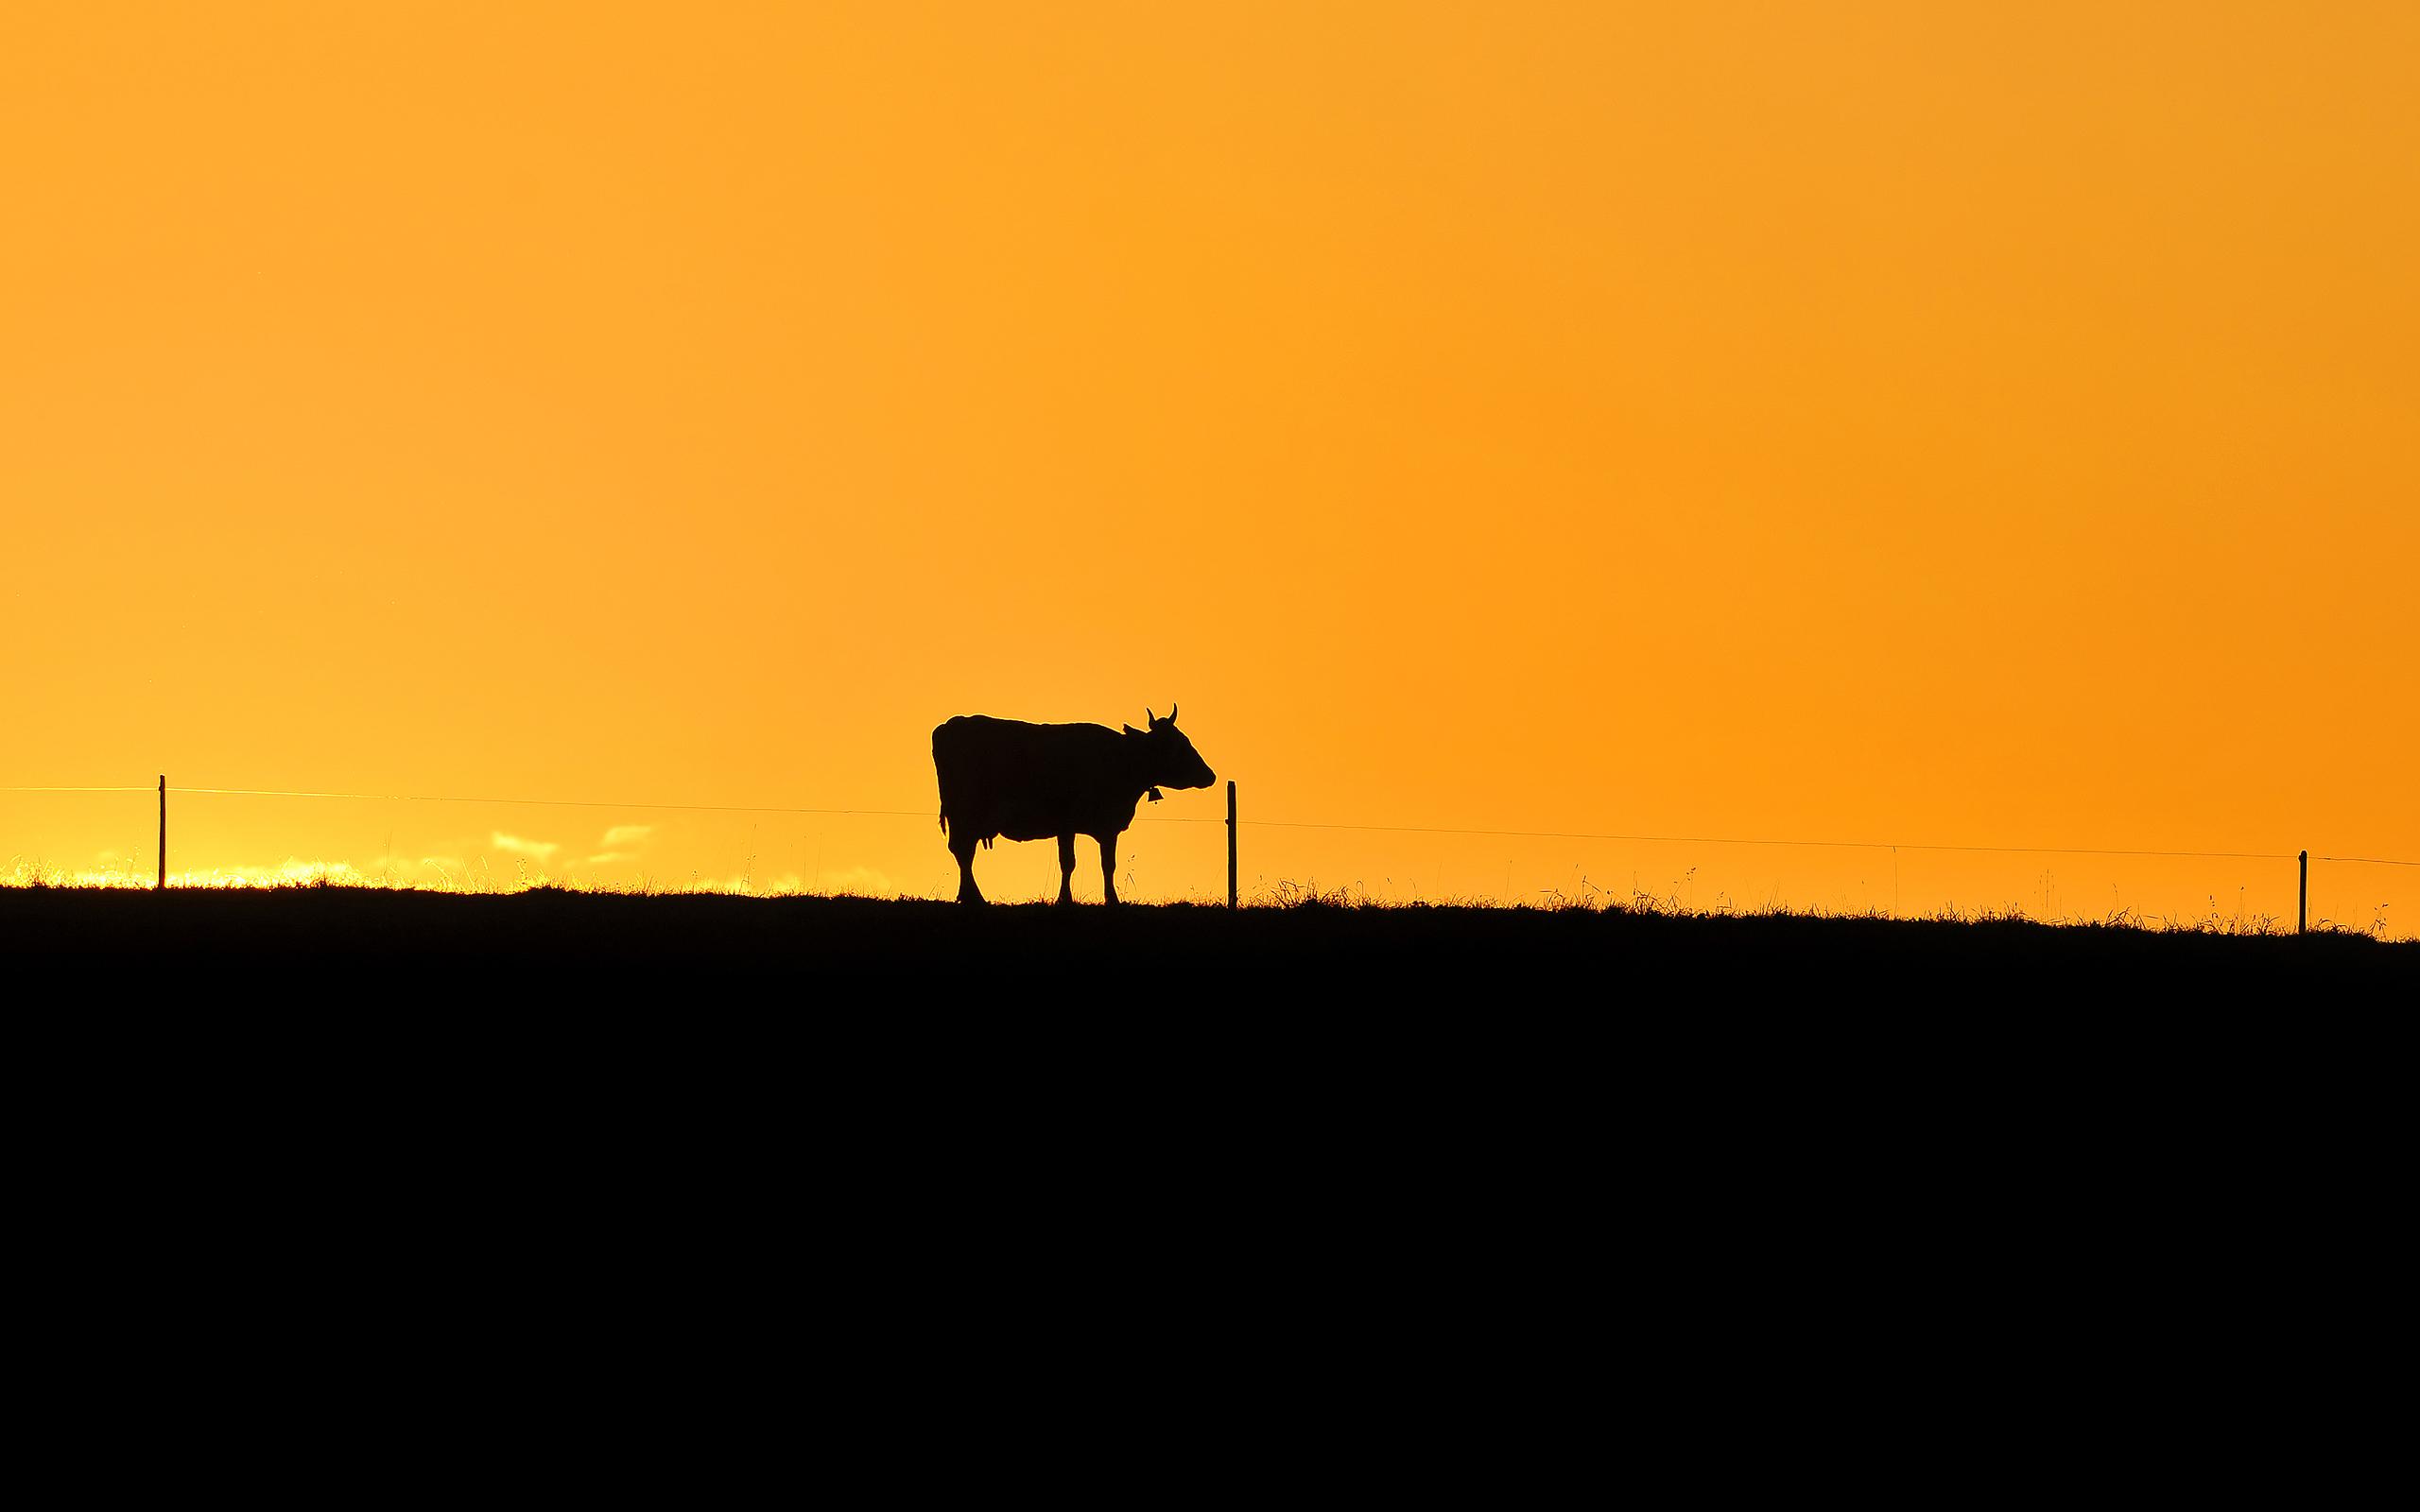 sunset images awesome